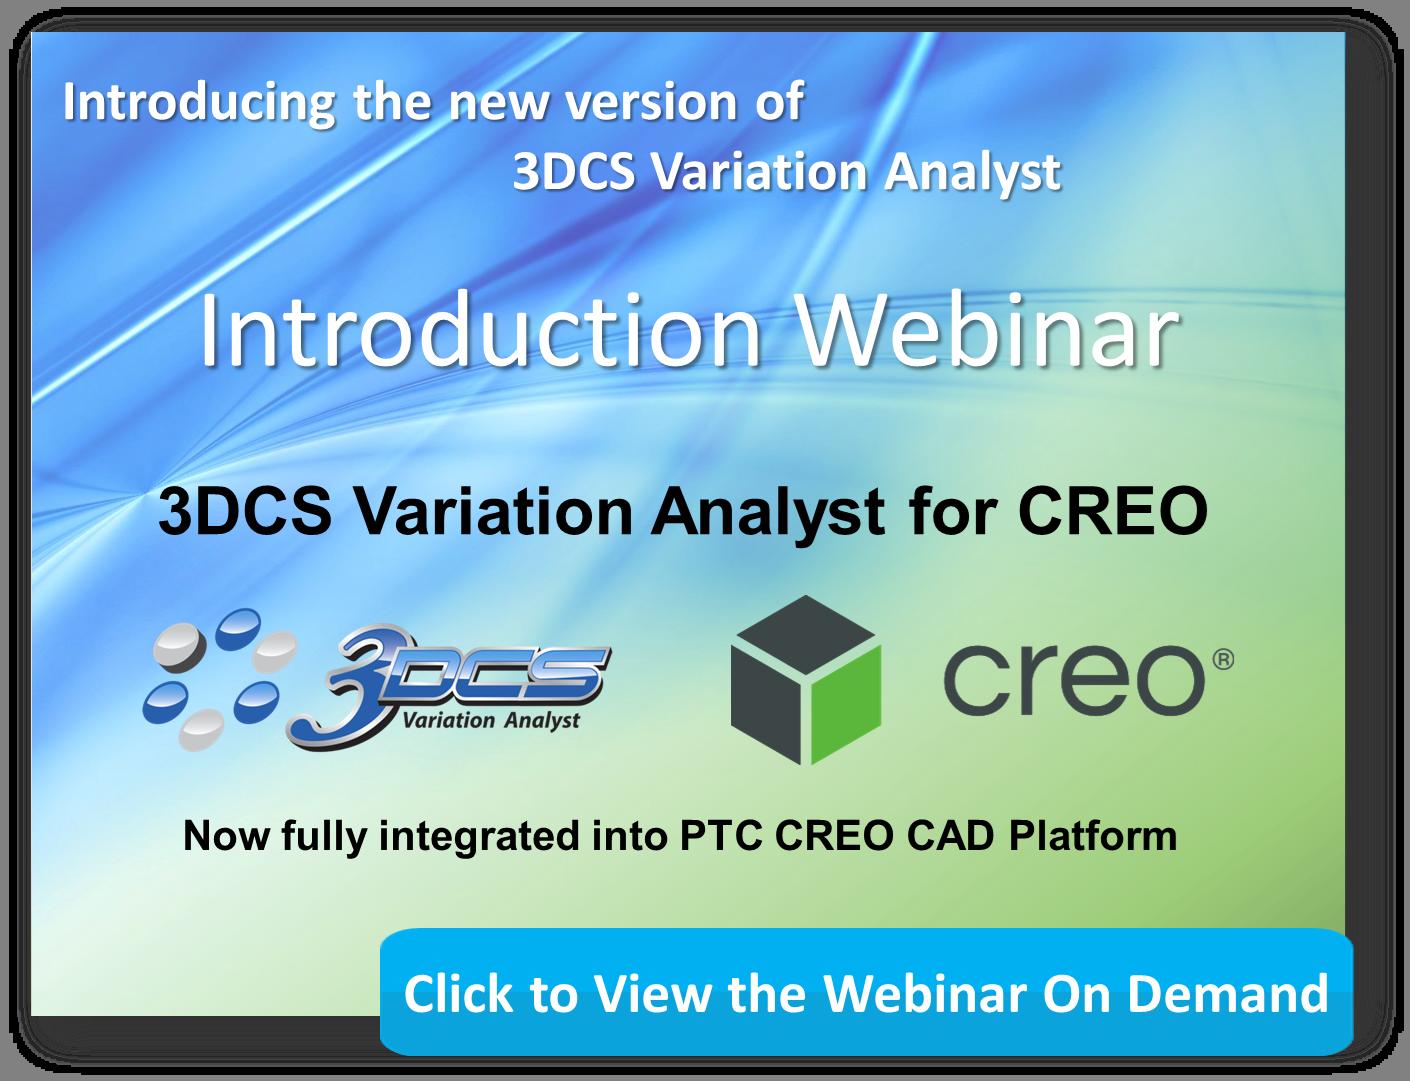 3dcs-for-creo-webinar-on-demand-sq.png